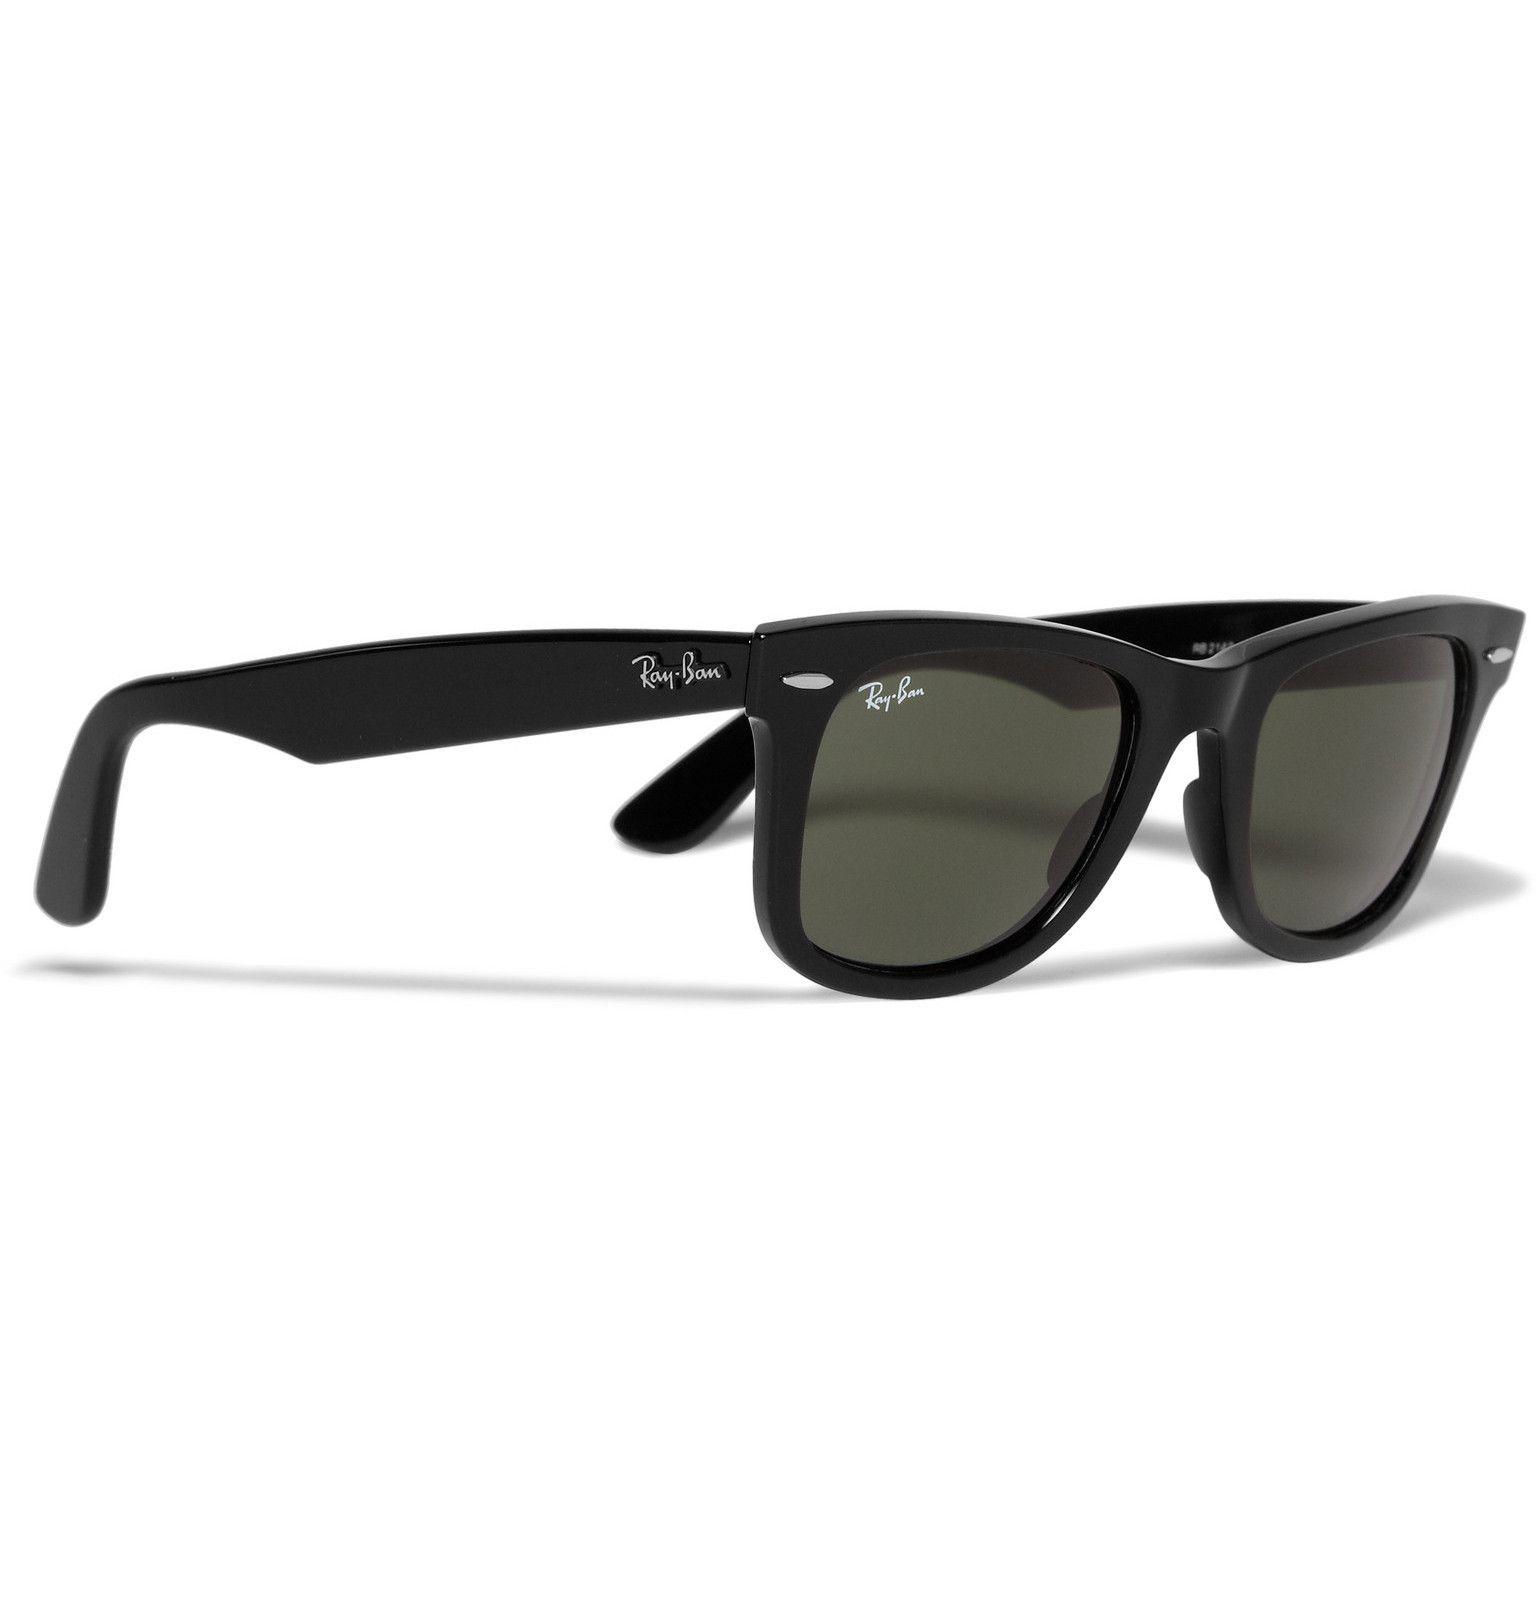 mens ray ban sunglasses sale uk